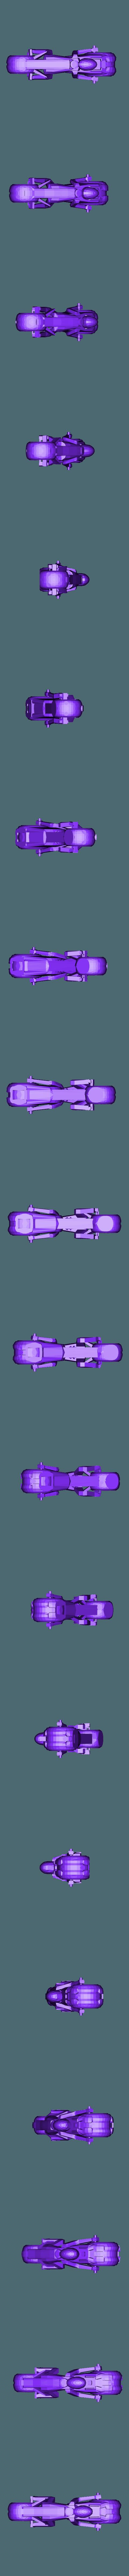 tron_bike_big.stl Download free STL file tron light cycle • Object to 3D print, procreator3D